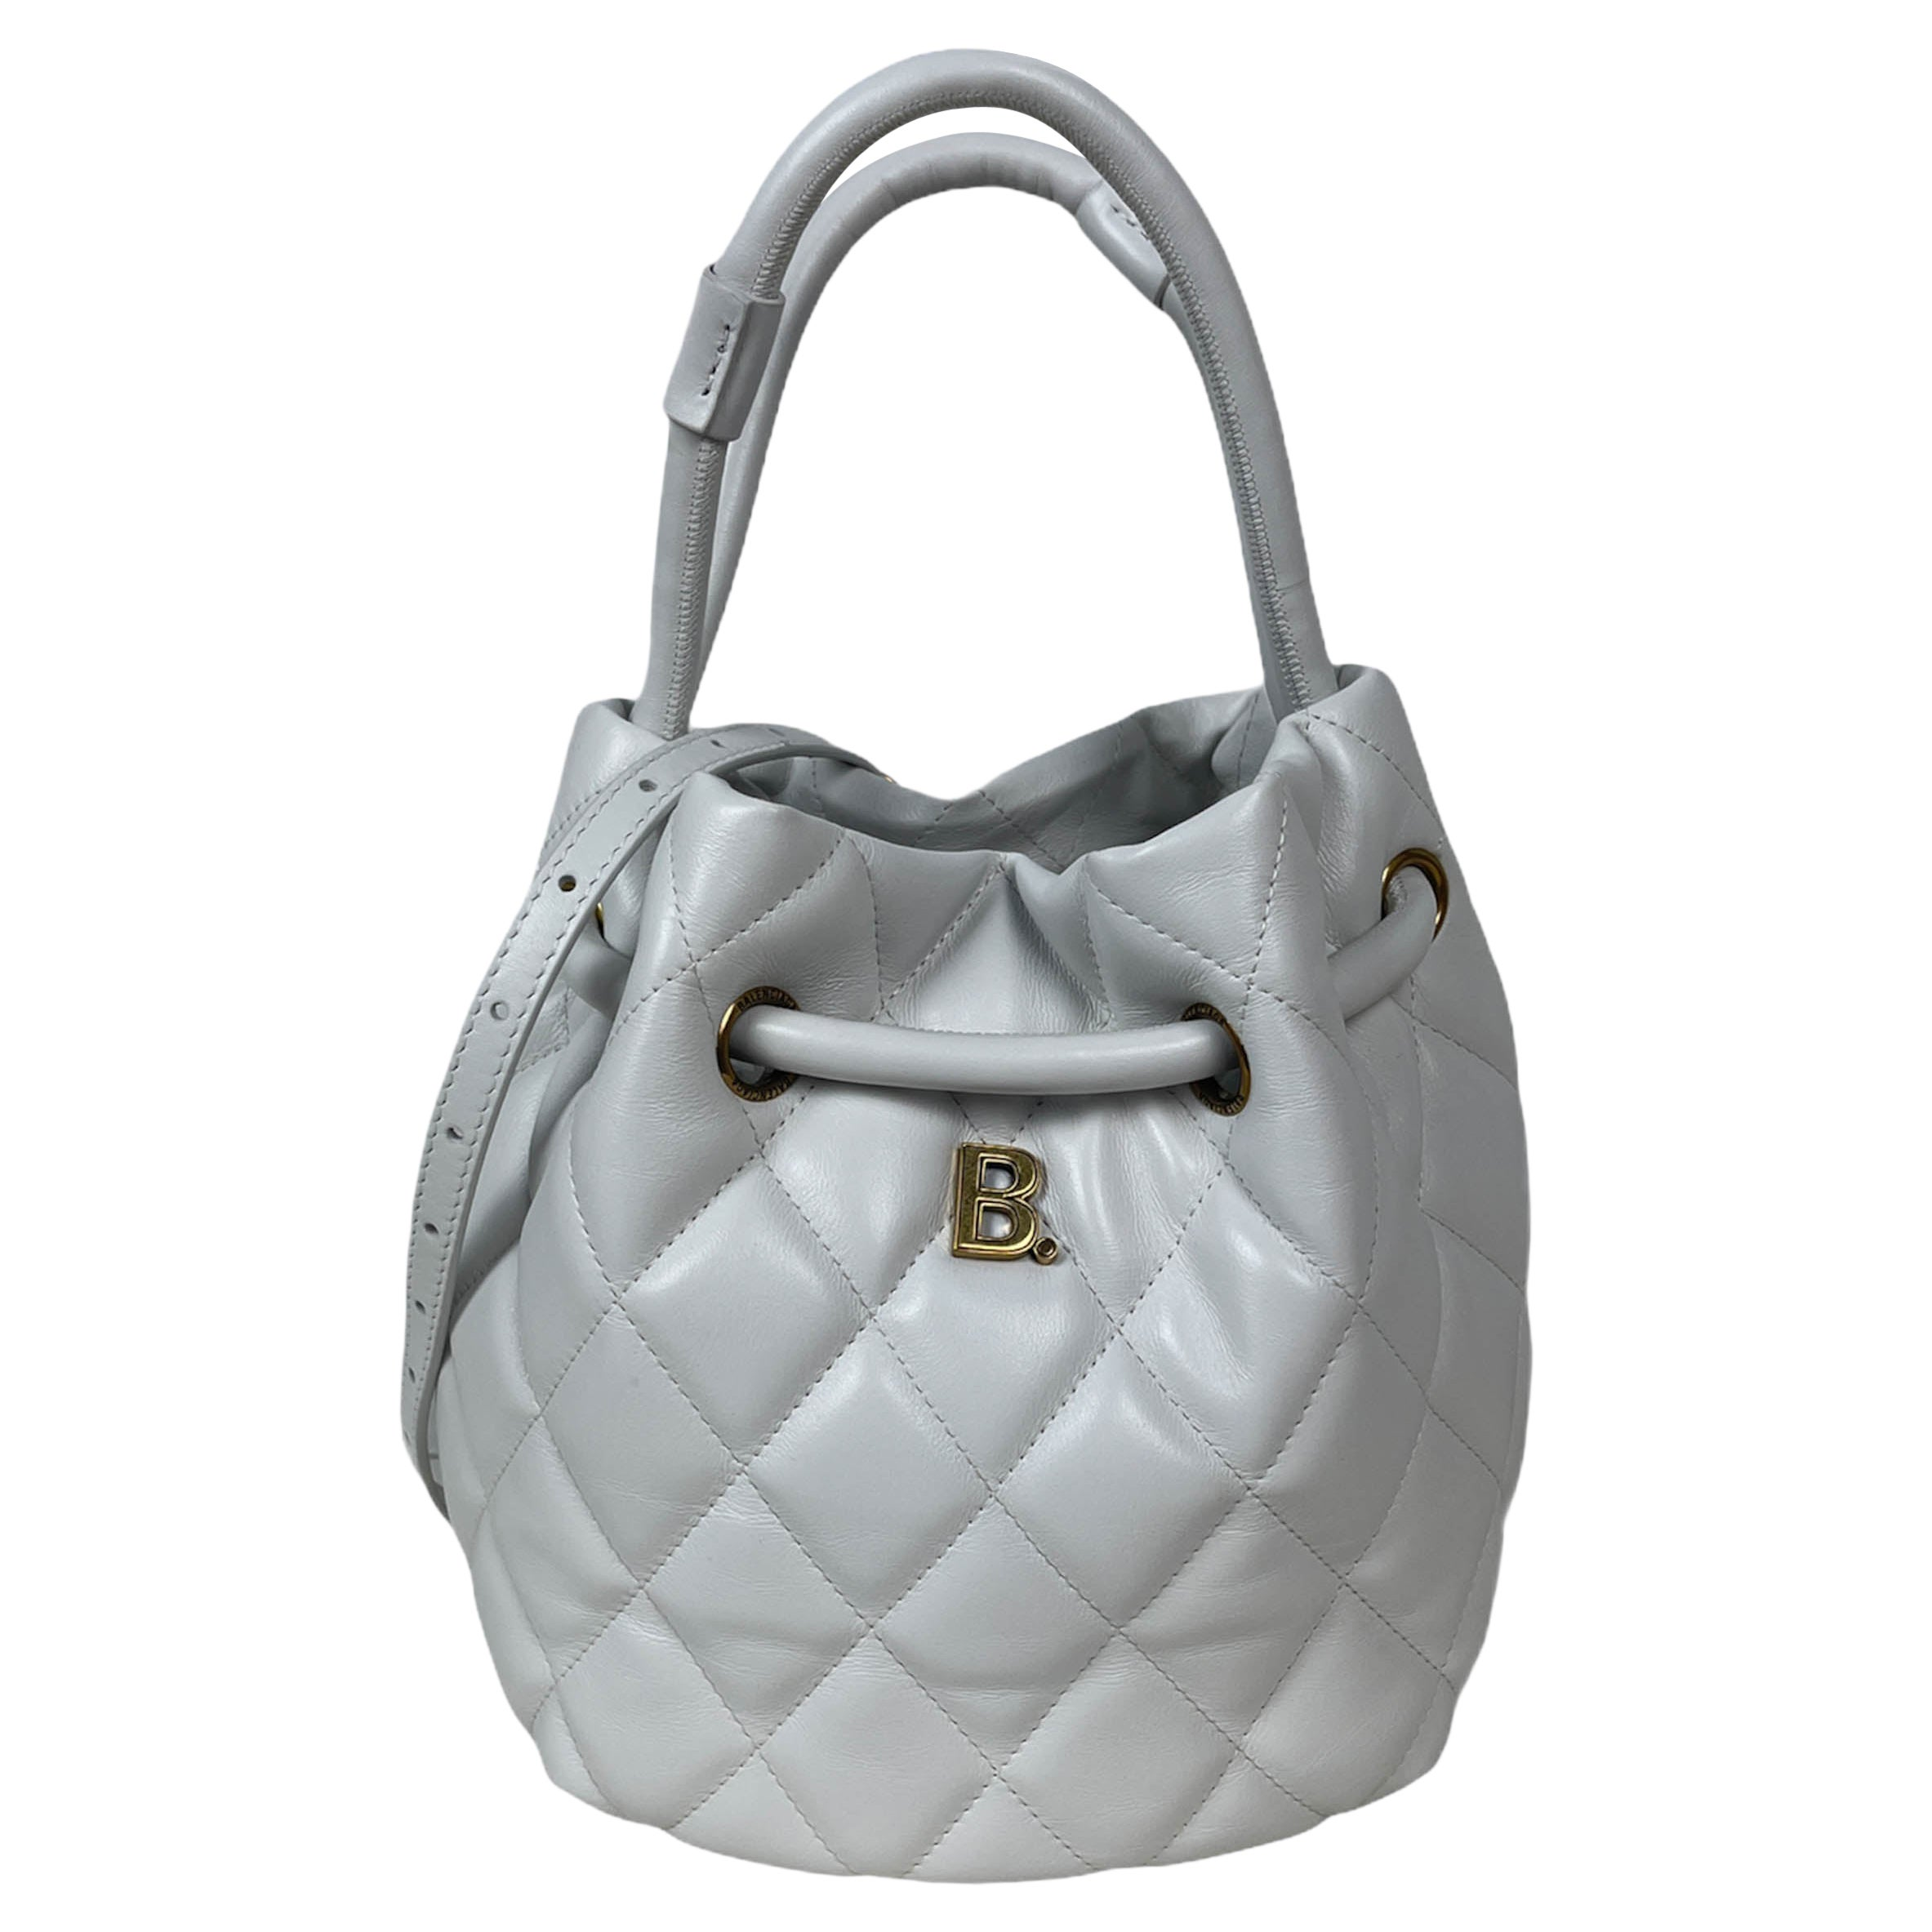 Balenciaga White Calfskin Leather B Dot Quilted Crossbody Bucket Bag